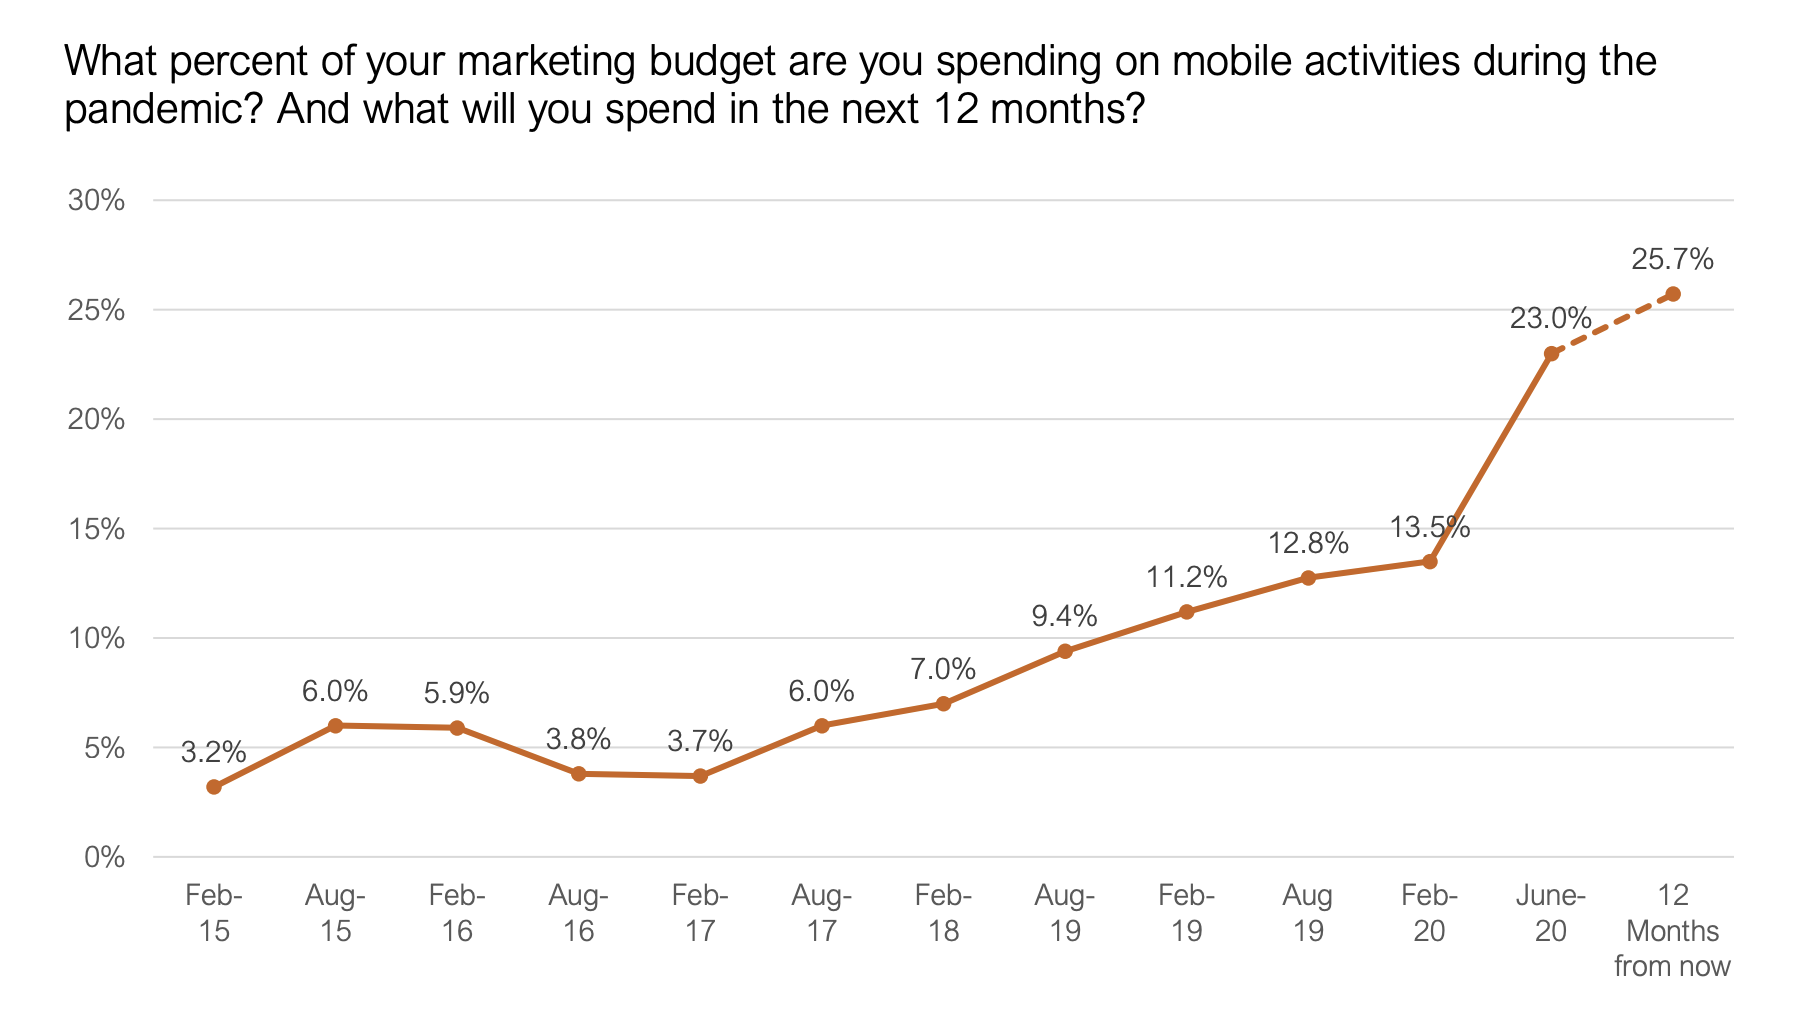 Mobile marketing budget data